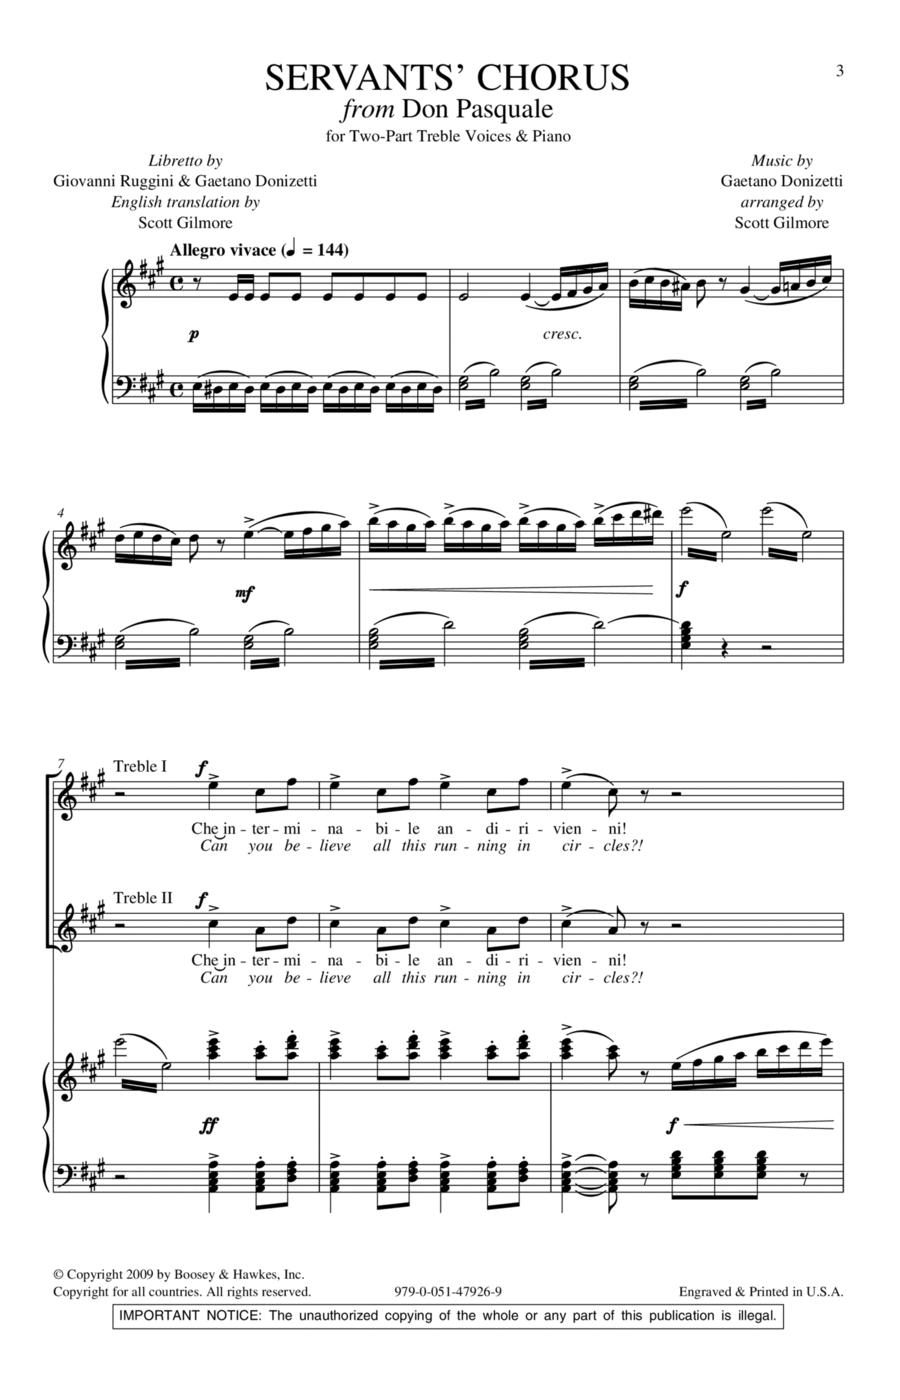 Servants' Chorus